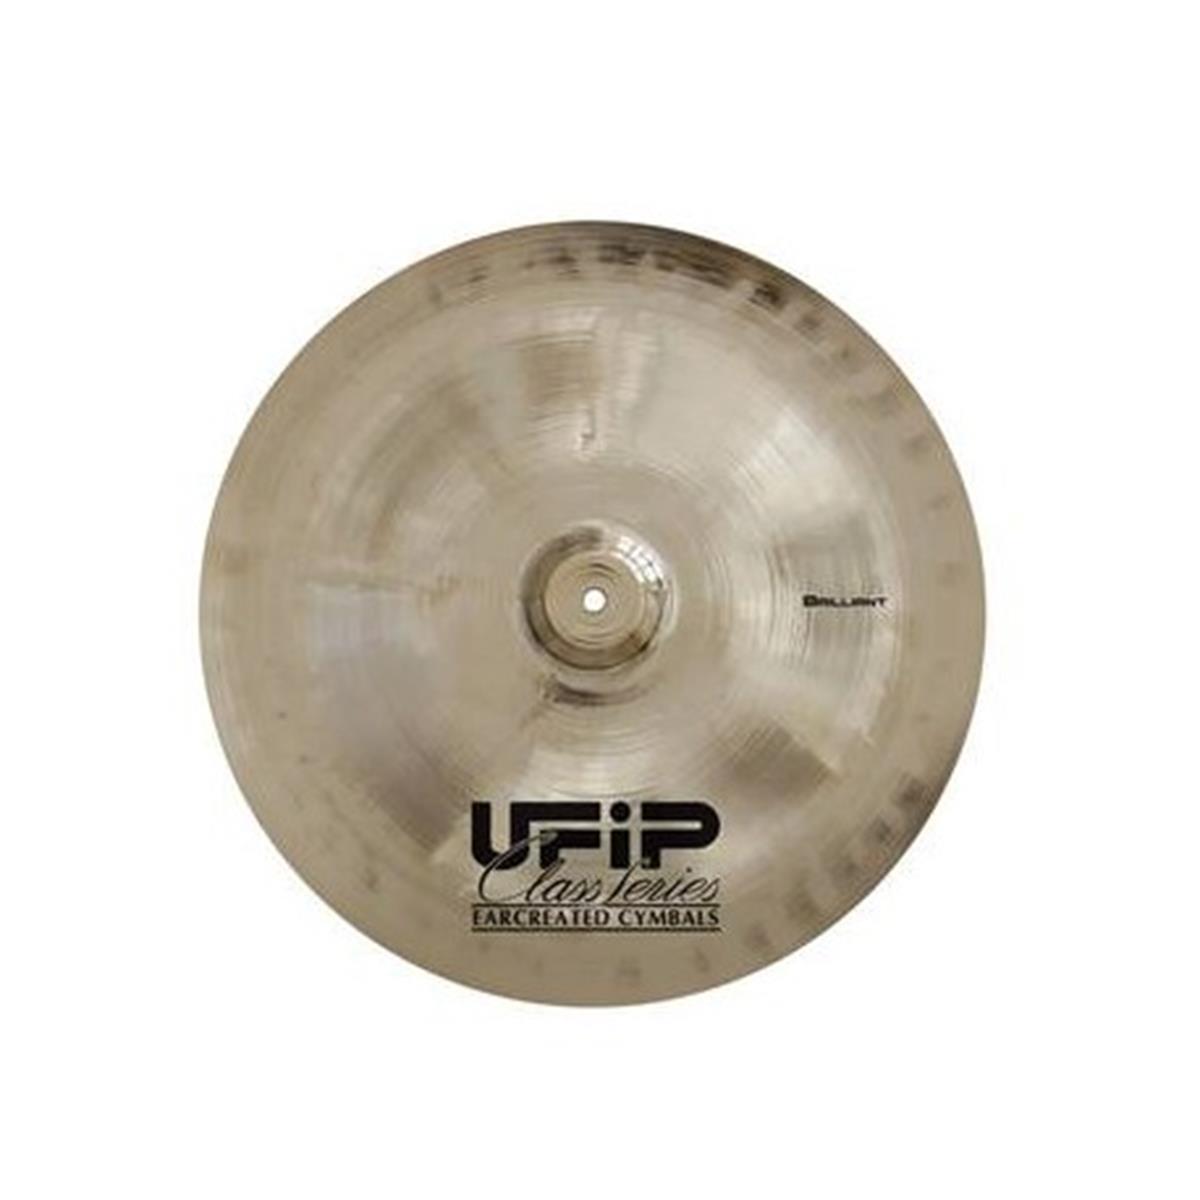 UFIP-CLASS-16-FAST-CHINA-BRILLIANT-sku-9378